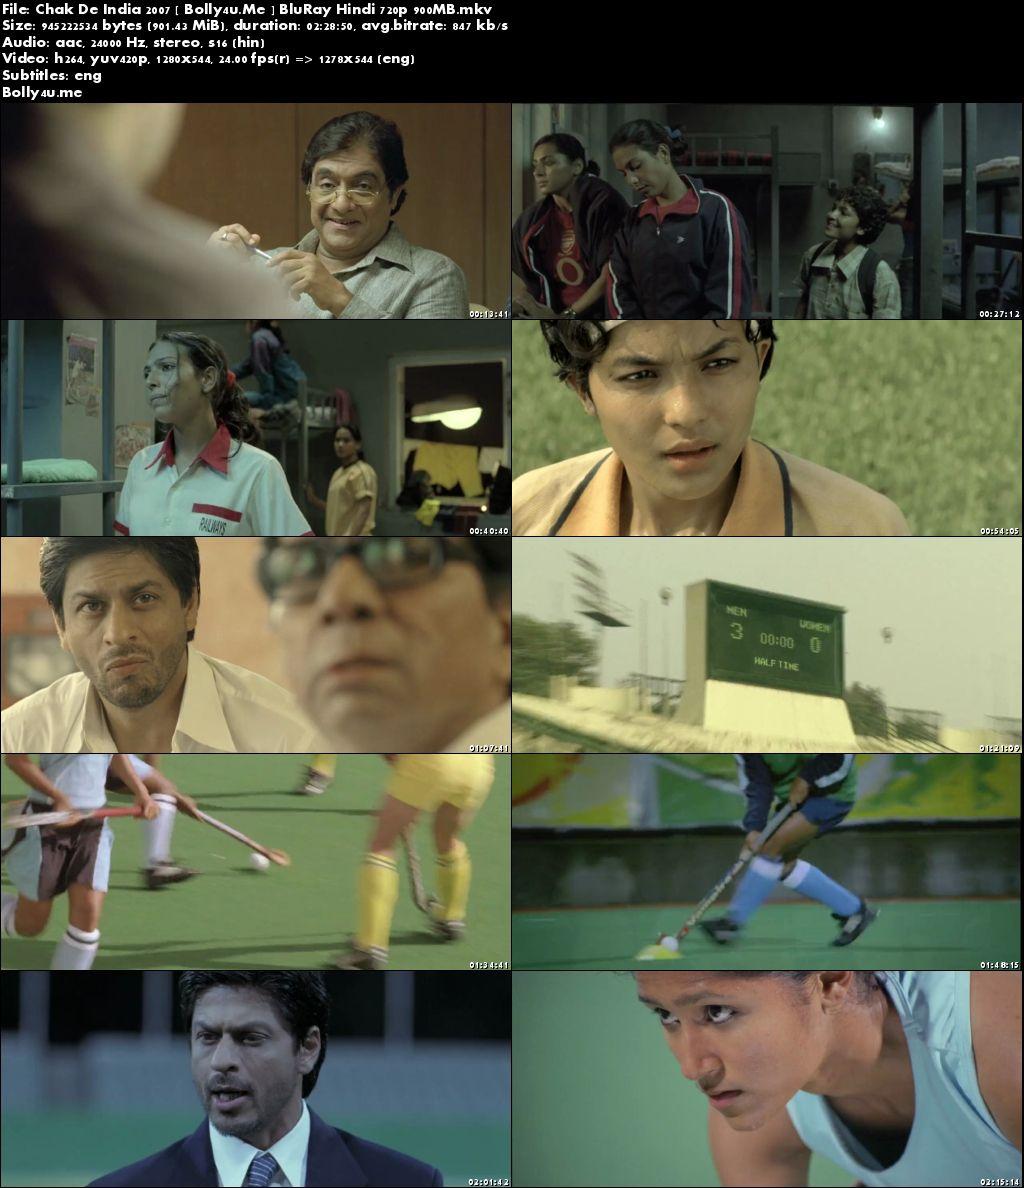 Chak De India 2007 BluRay 900MB Full Hindi Movie Download 720p